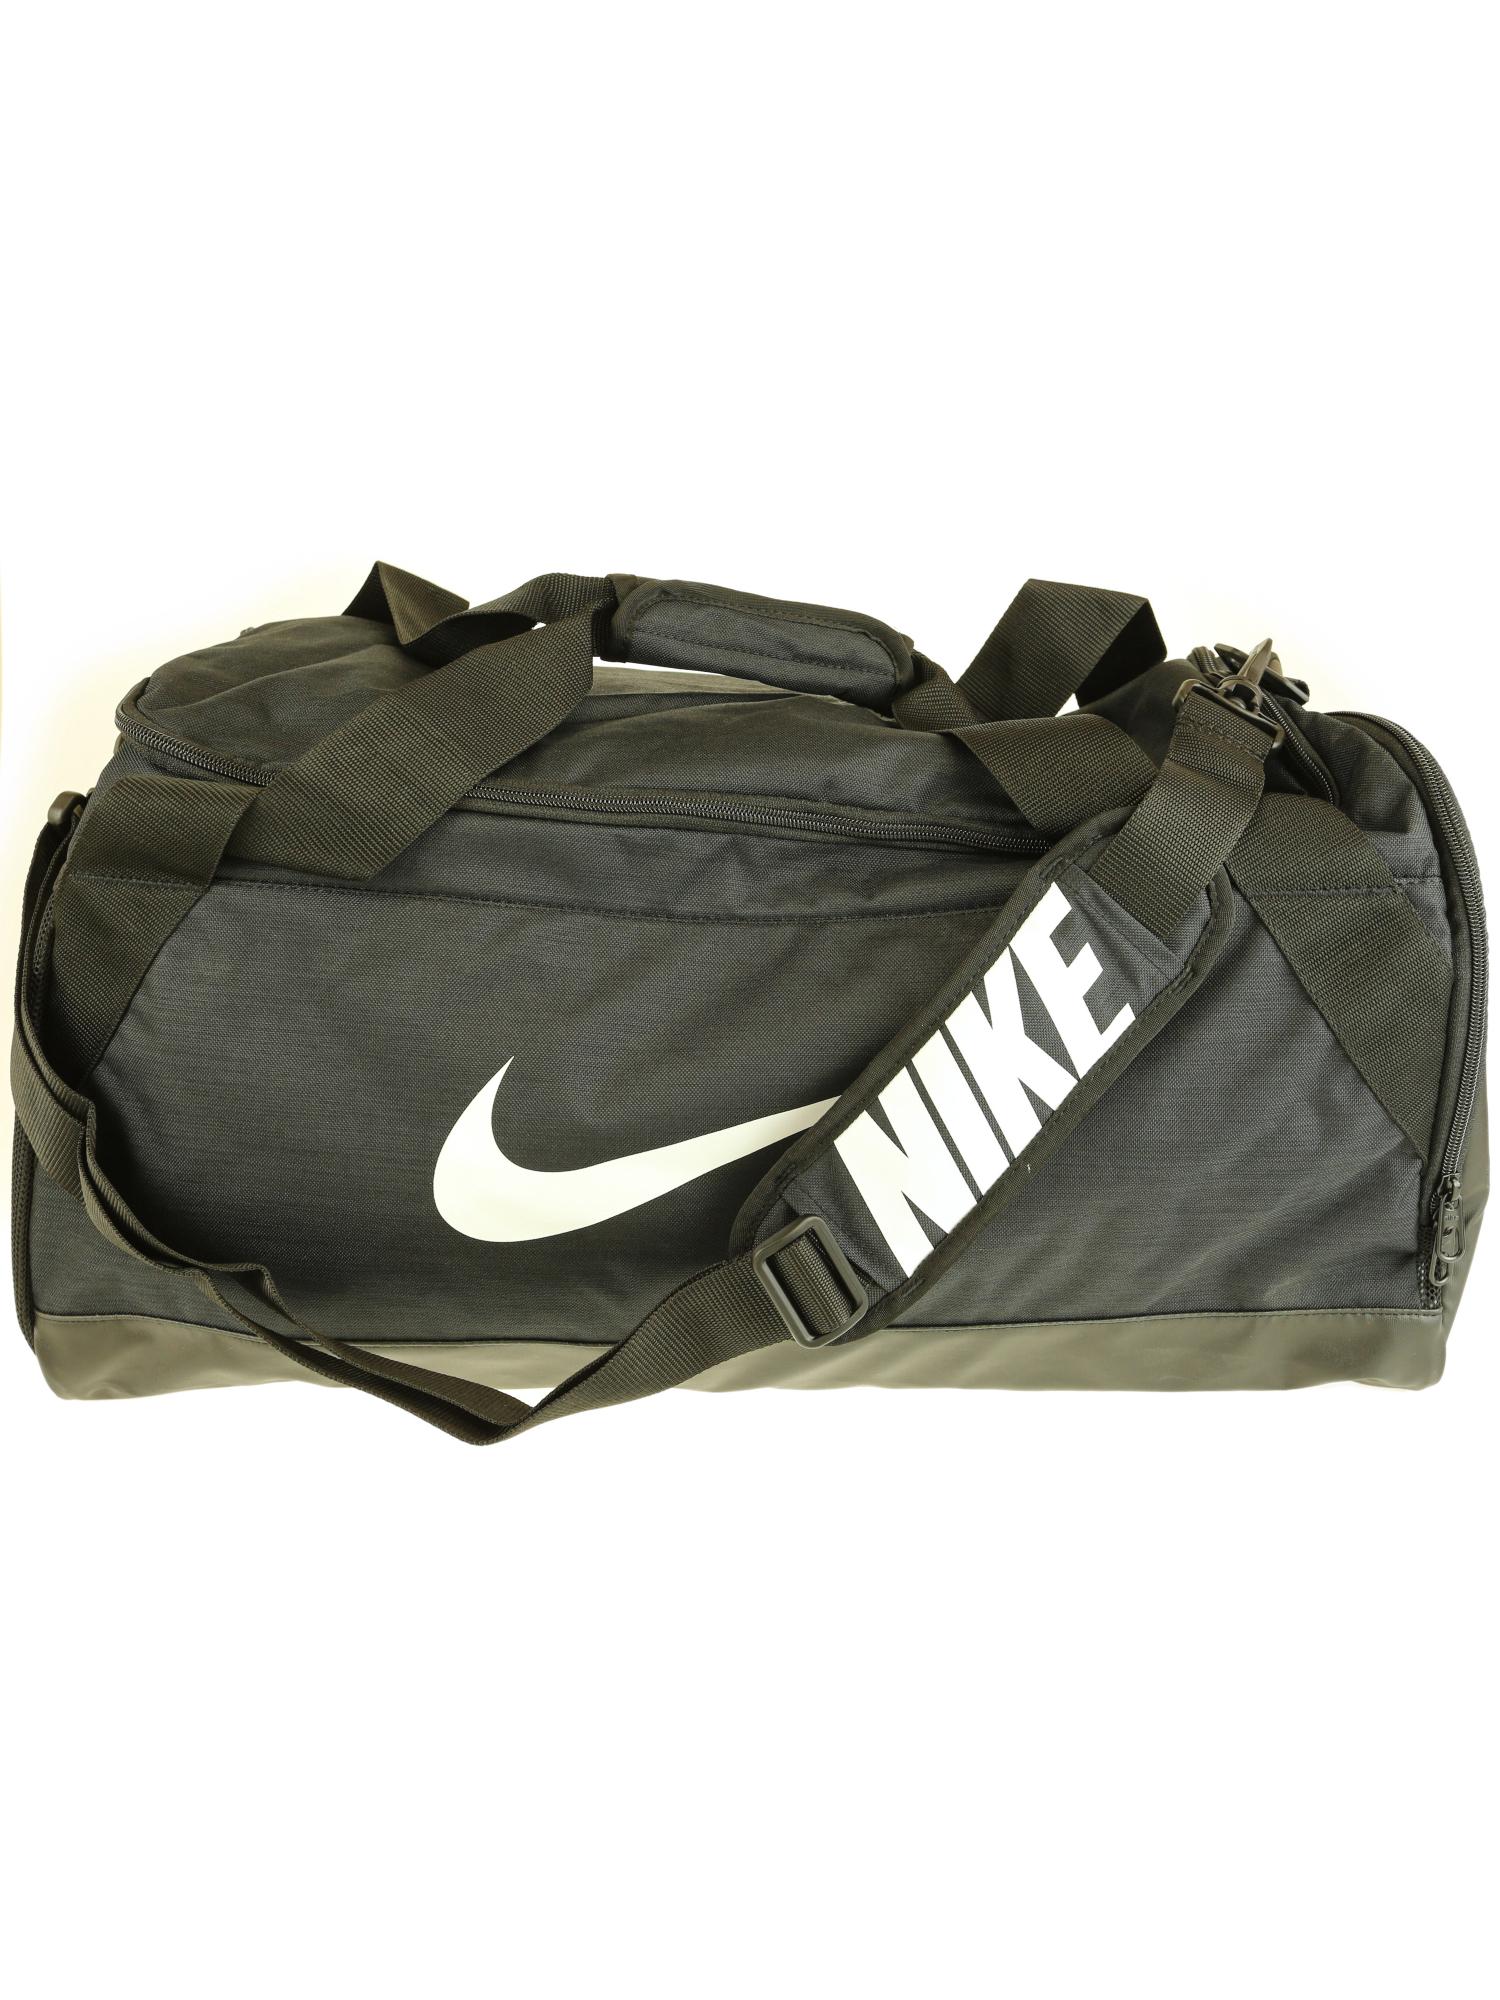 99f3e91093391 Nike Brasilia Medium Gym Training Duffel Bag Black Ba5334 010 ...